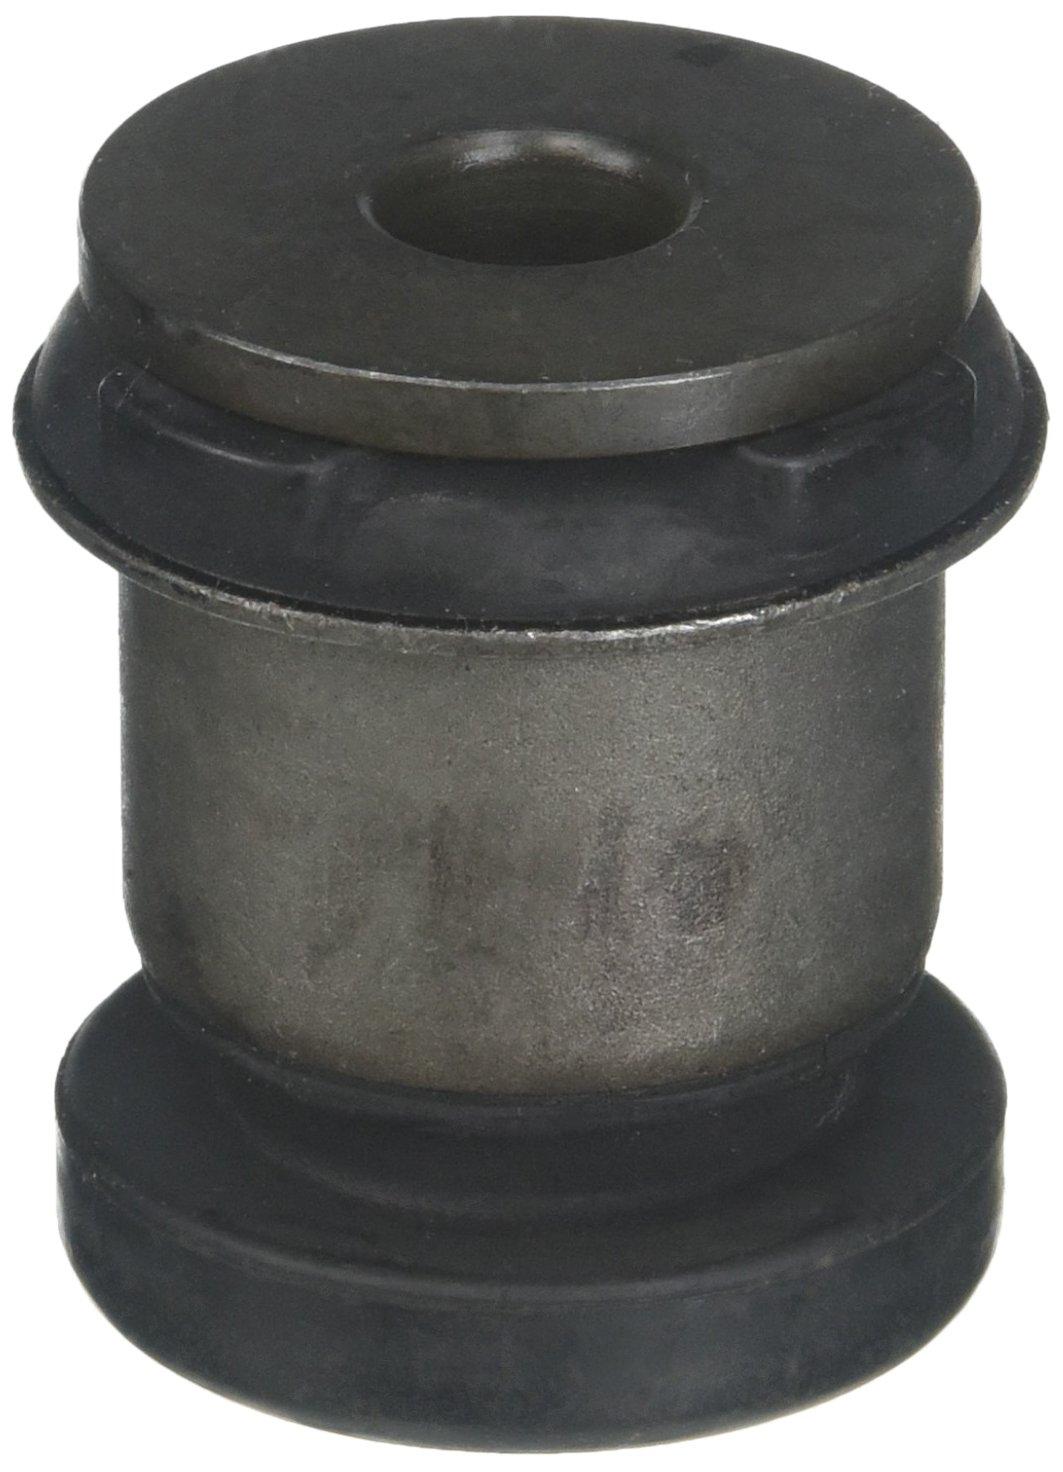 MOOG Chassis Products Moog K201330 Control Arm Bushing